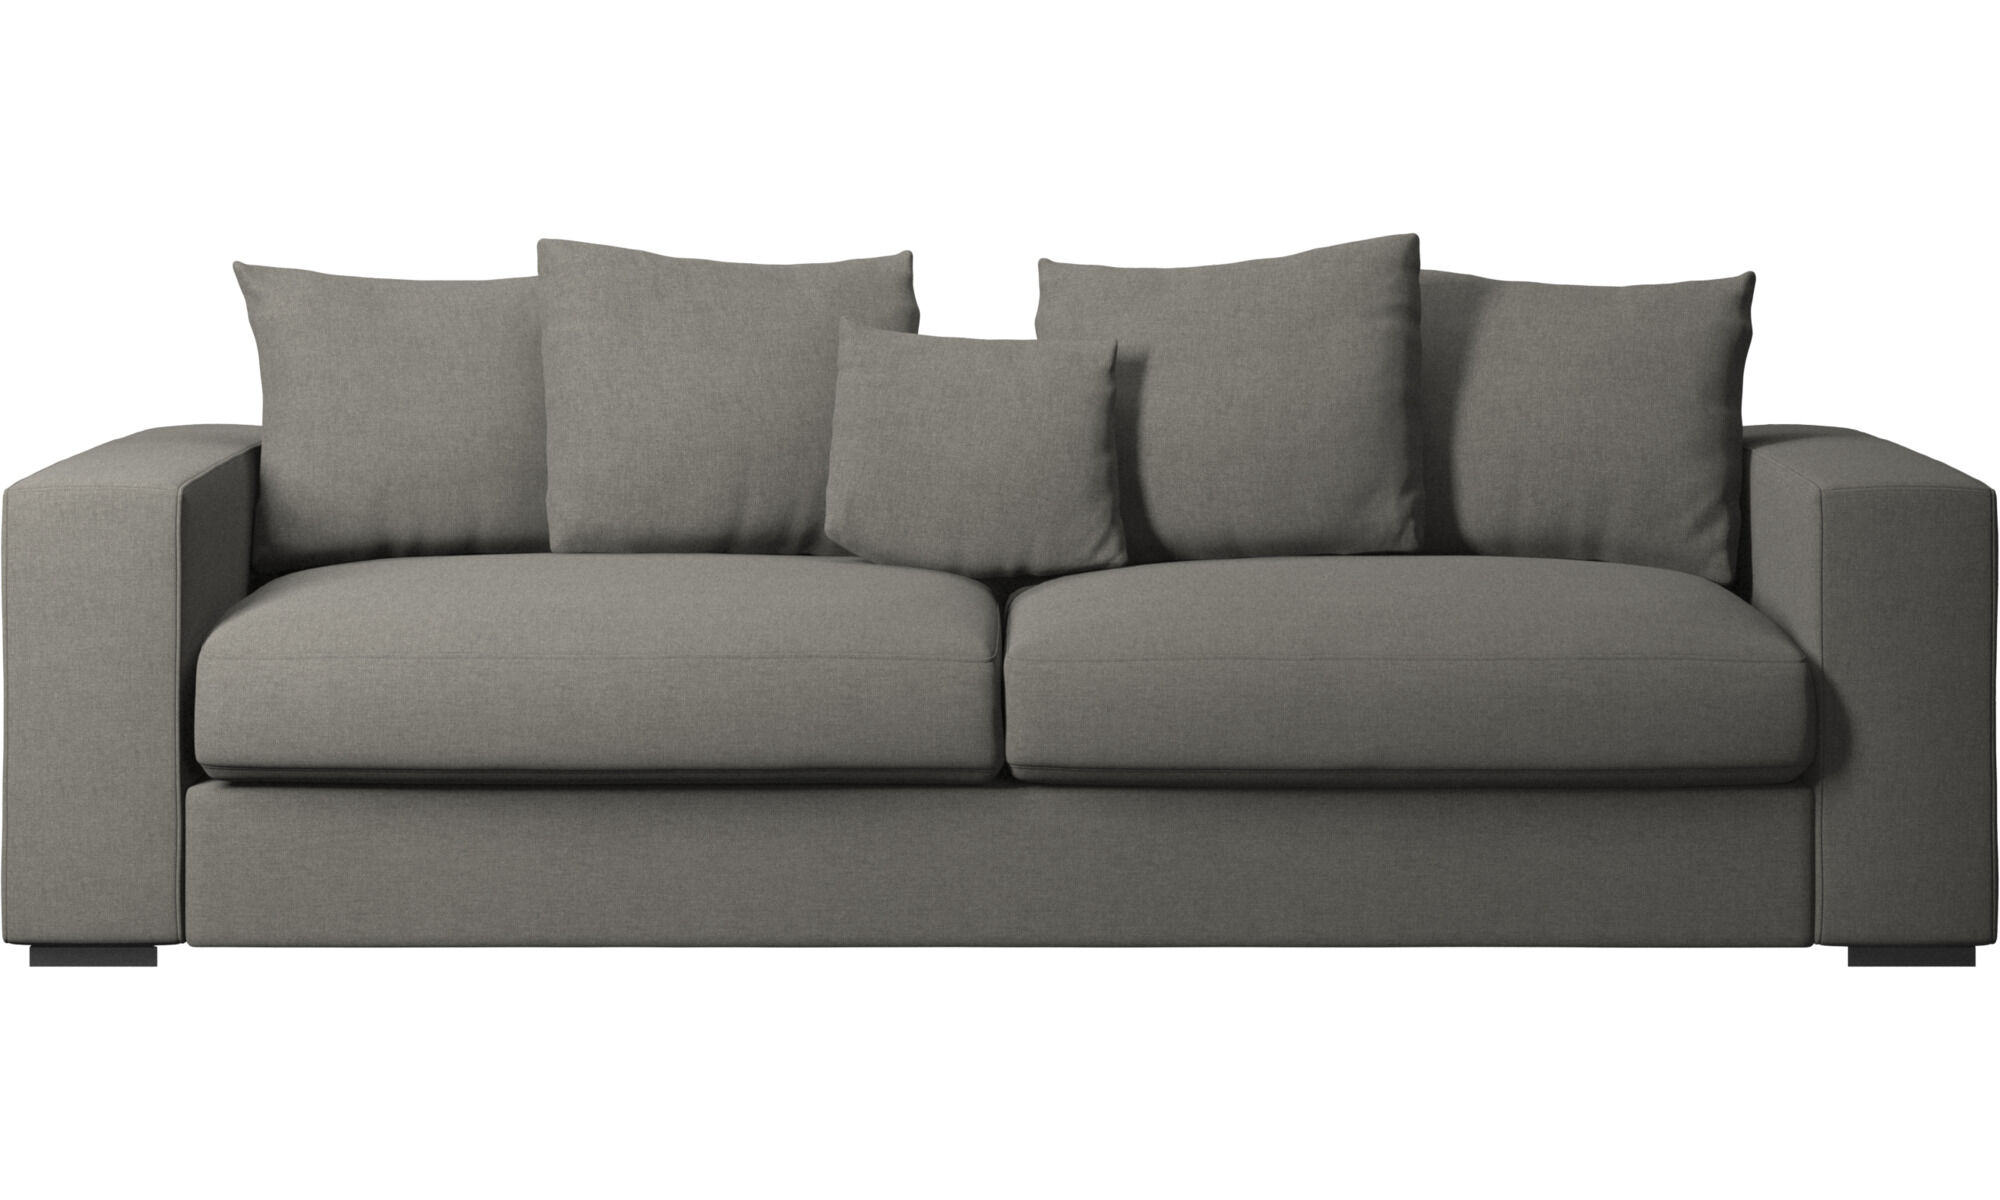 Divano Rosa Cipria : Seater sofas cenova divano boconcept